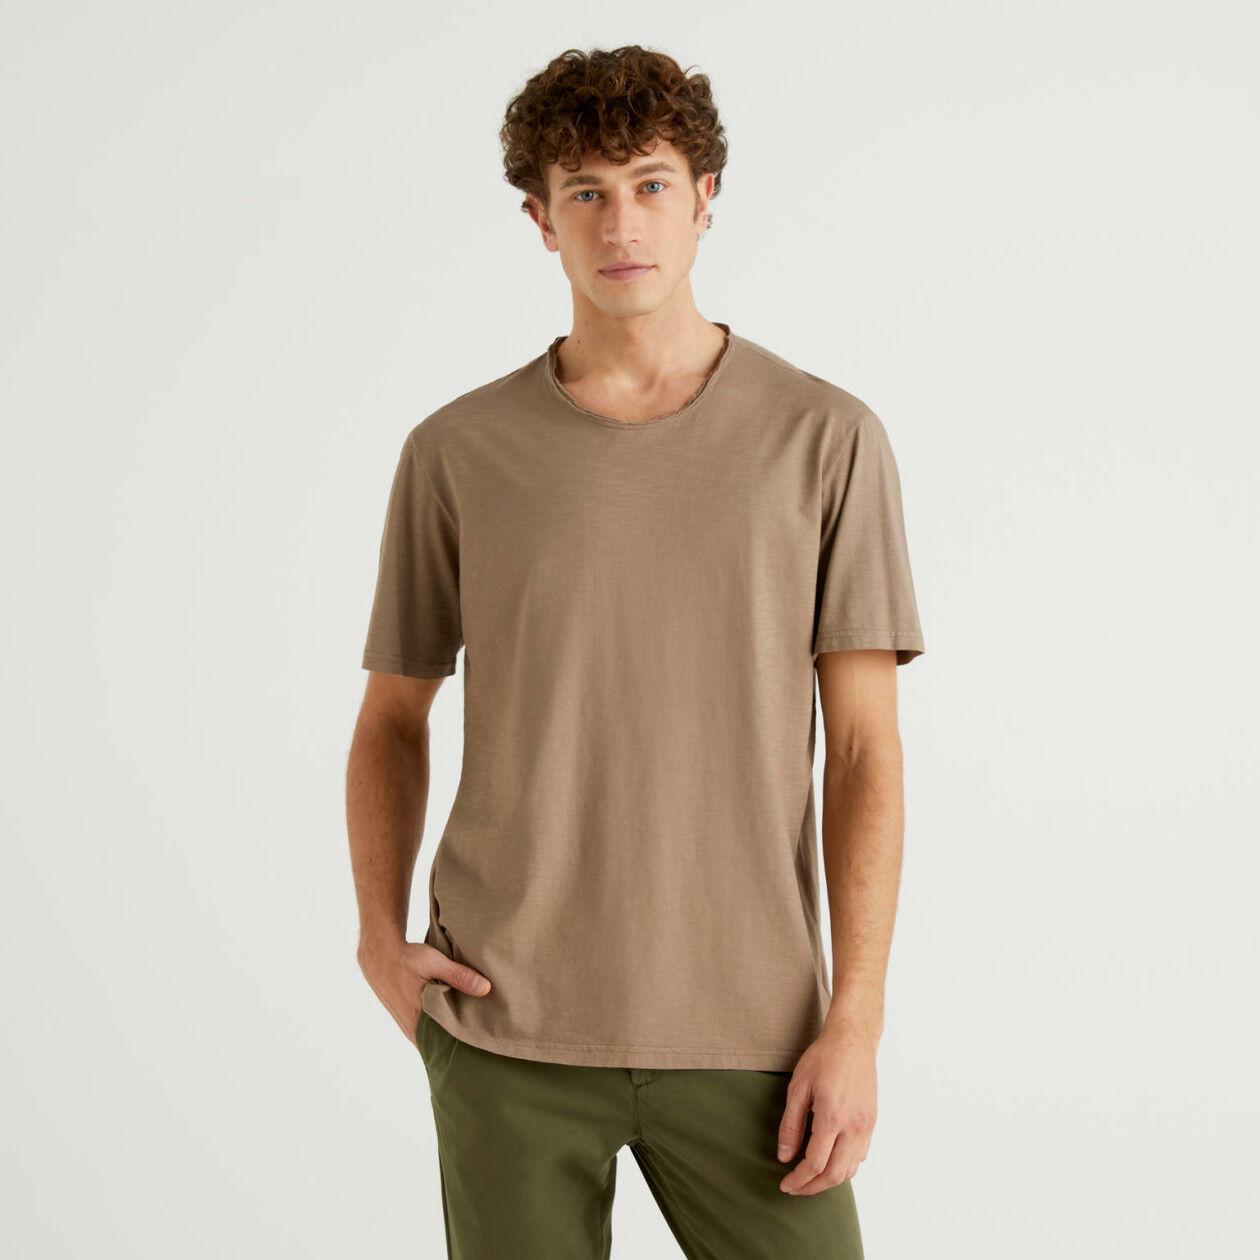 Camiseta gris paloma de 100% algodón